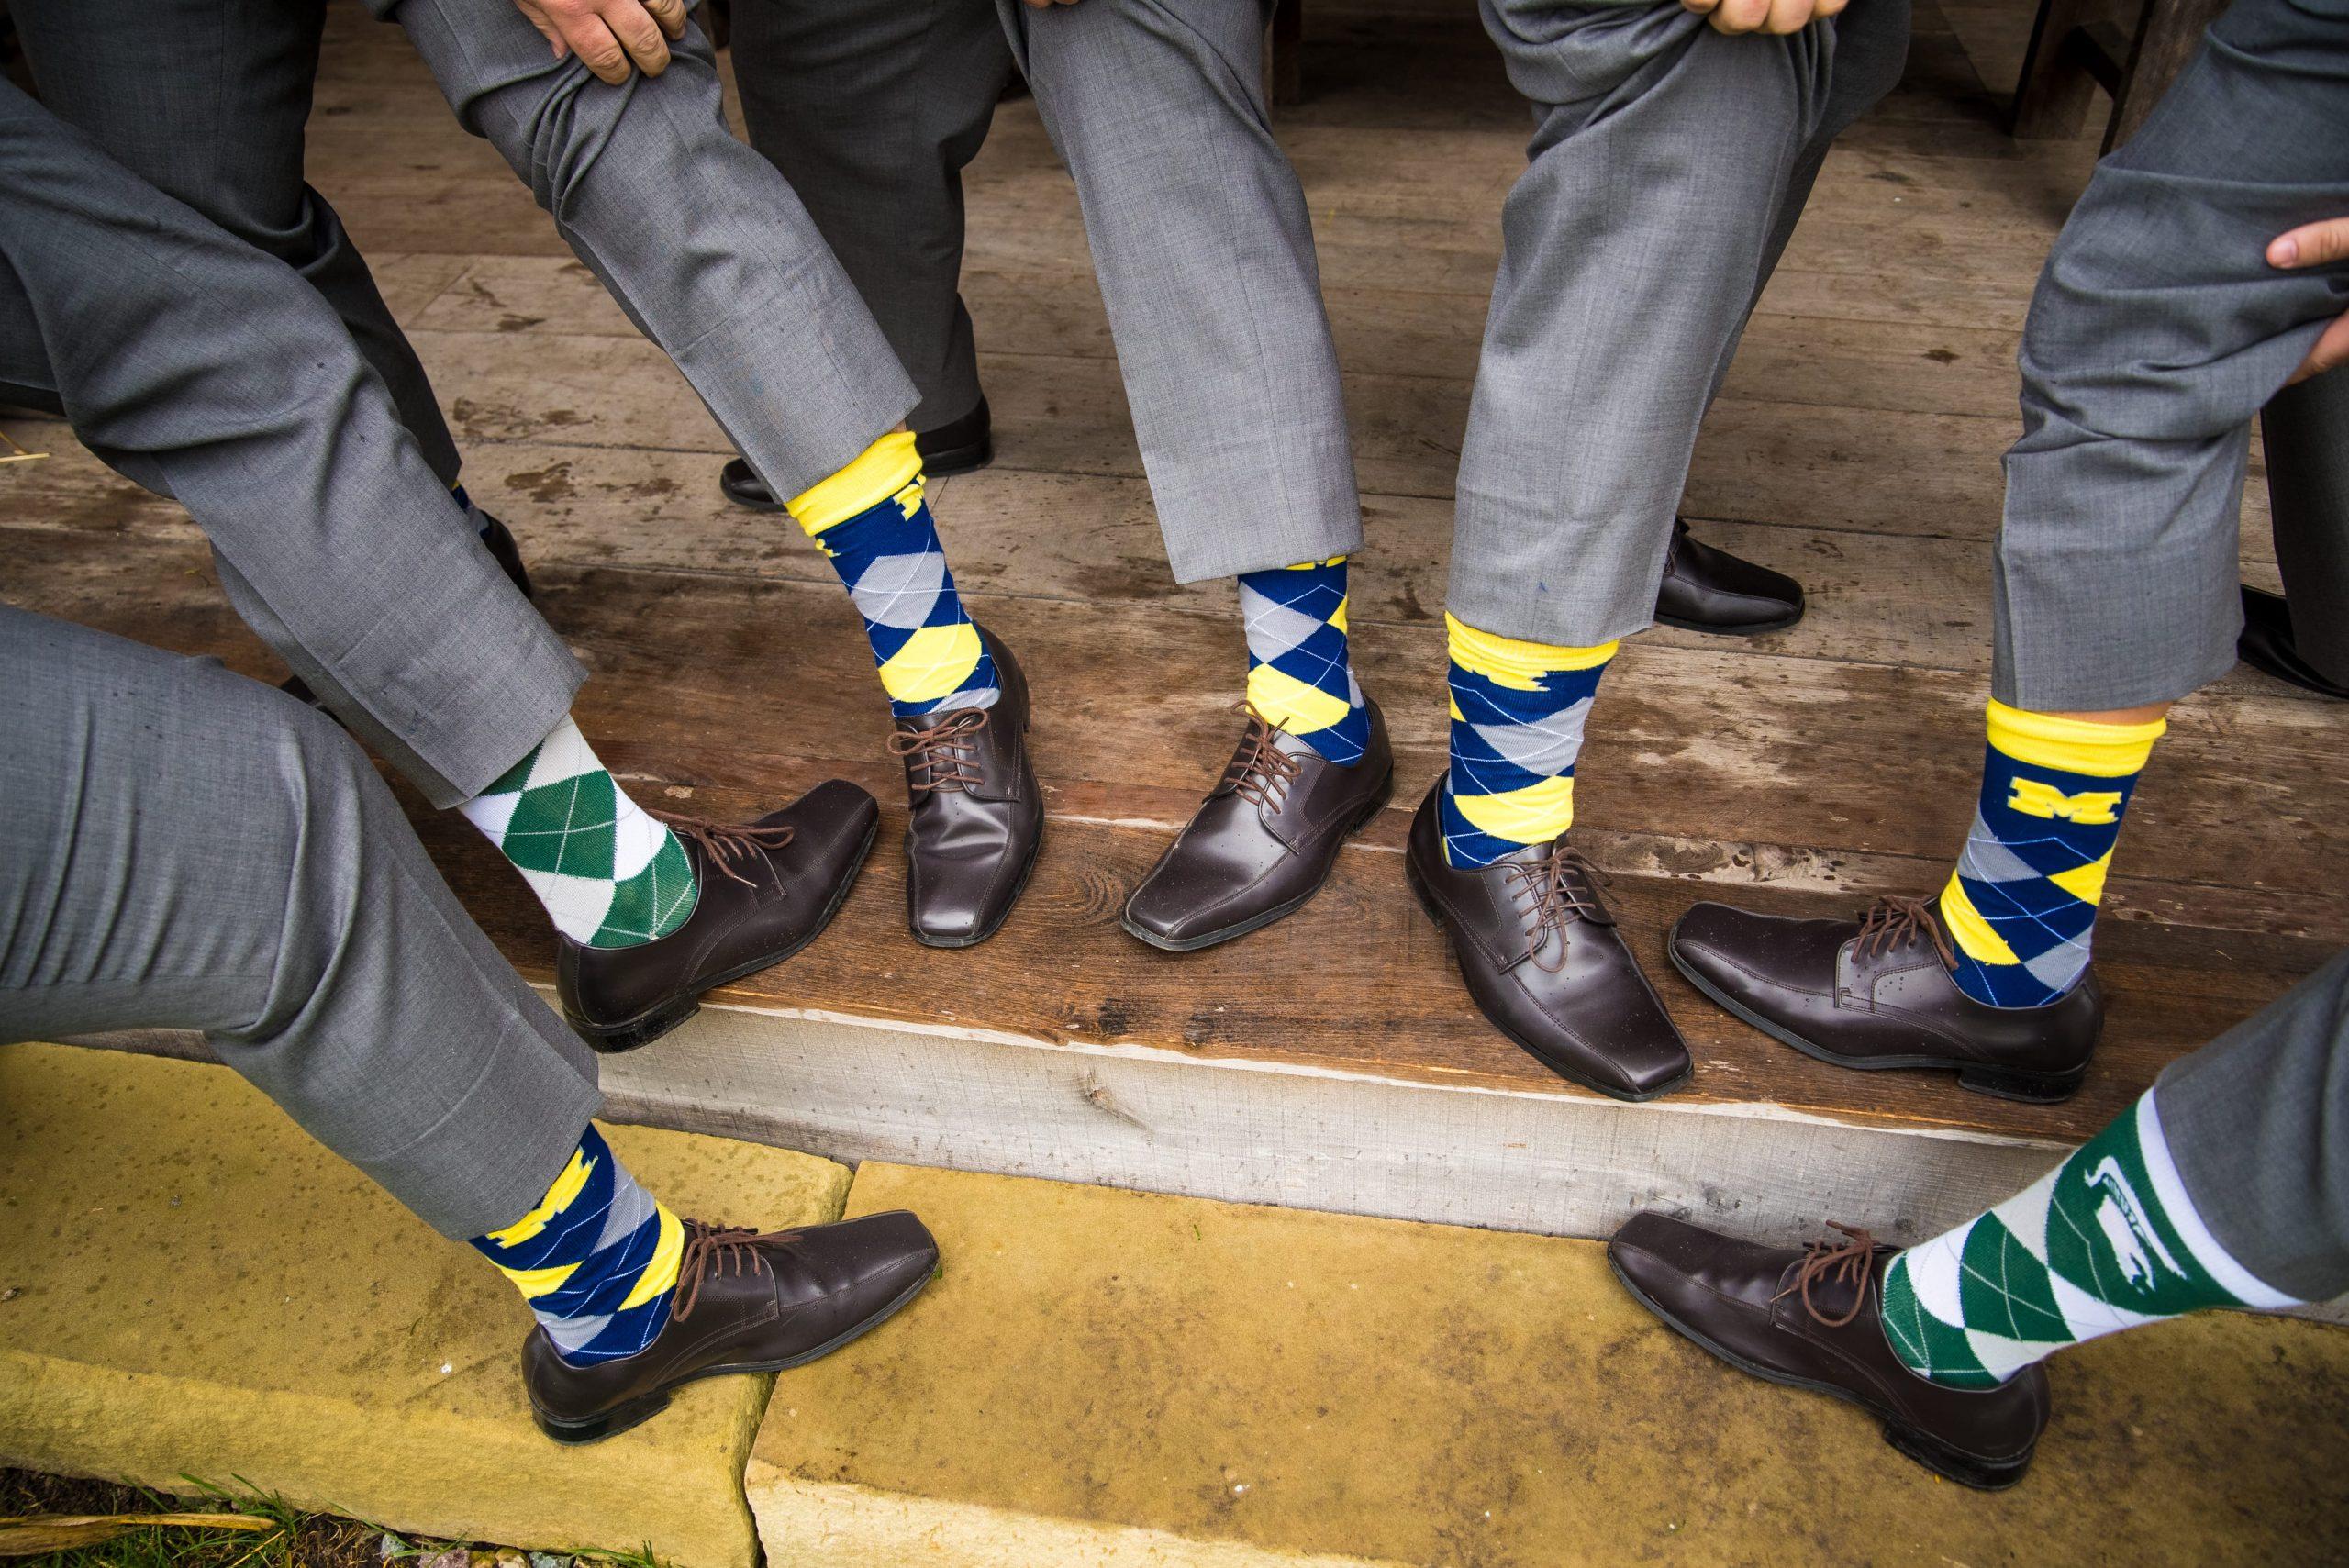 Michigan Michigan state wedding socks